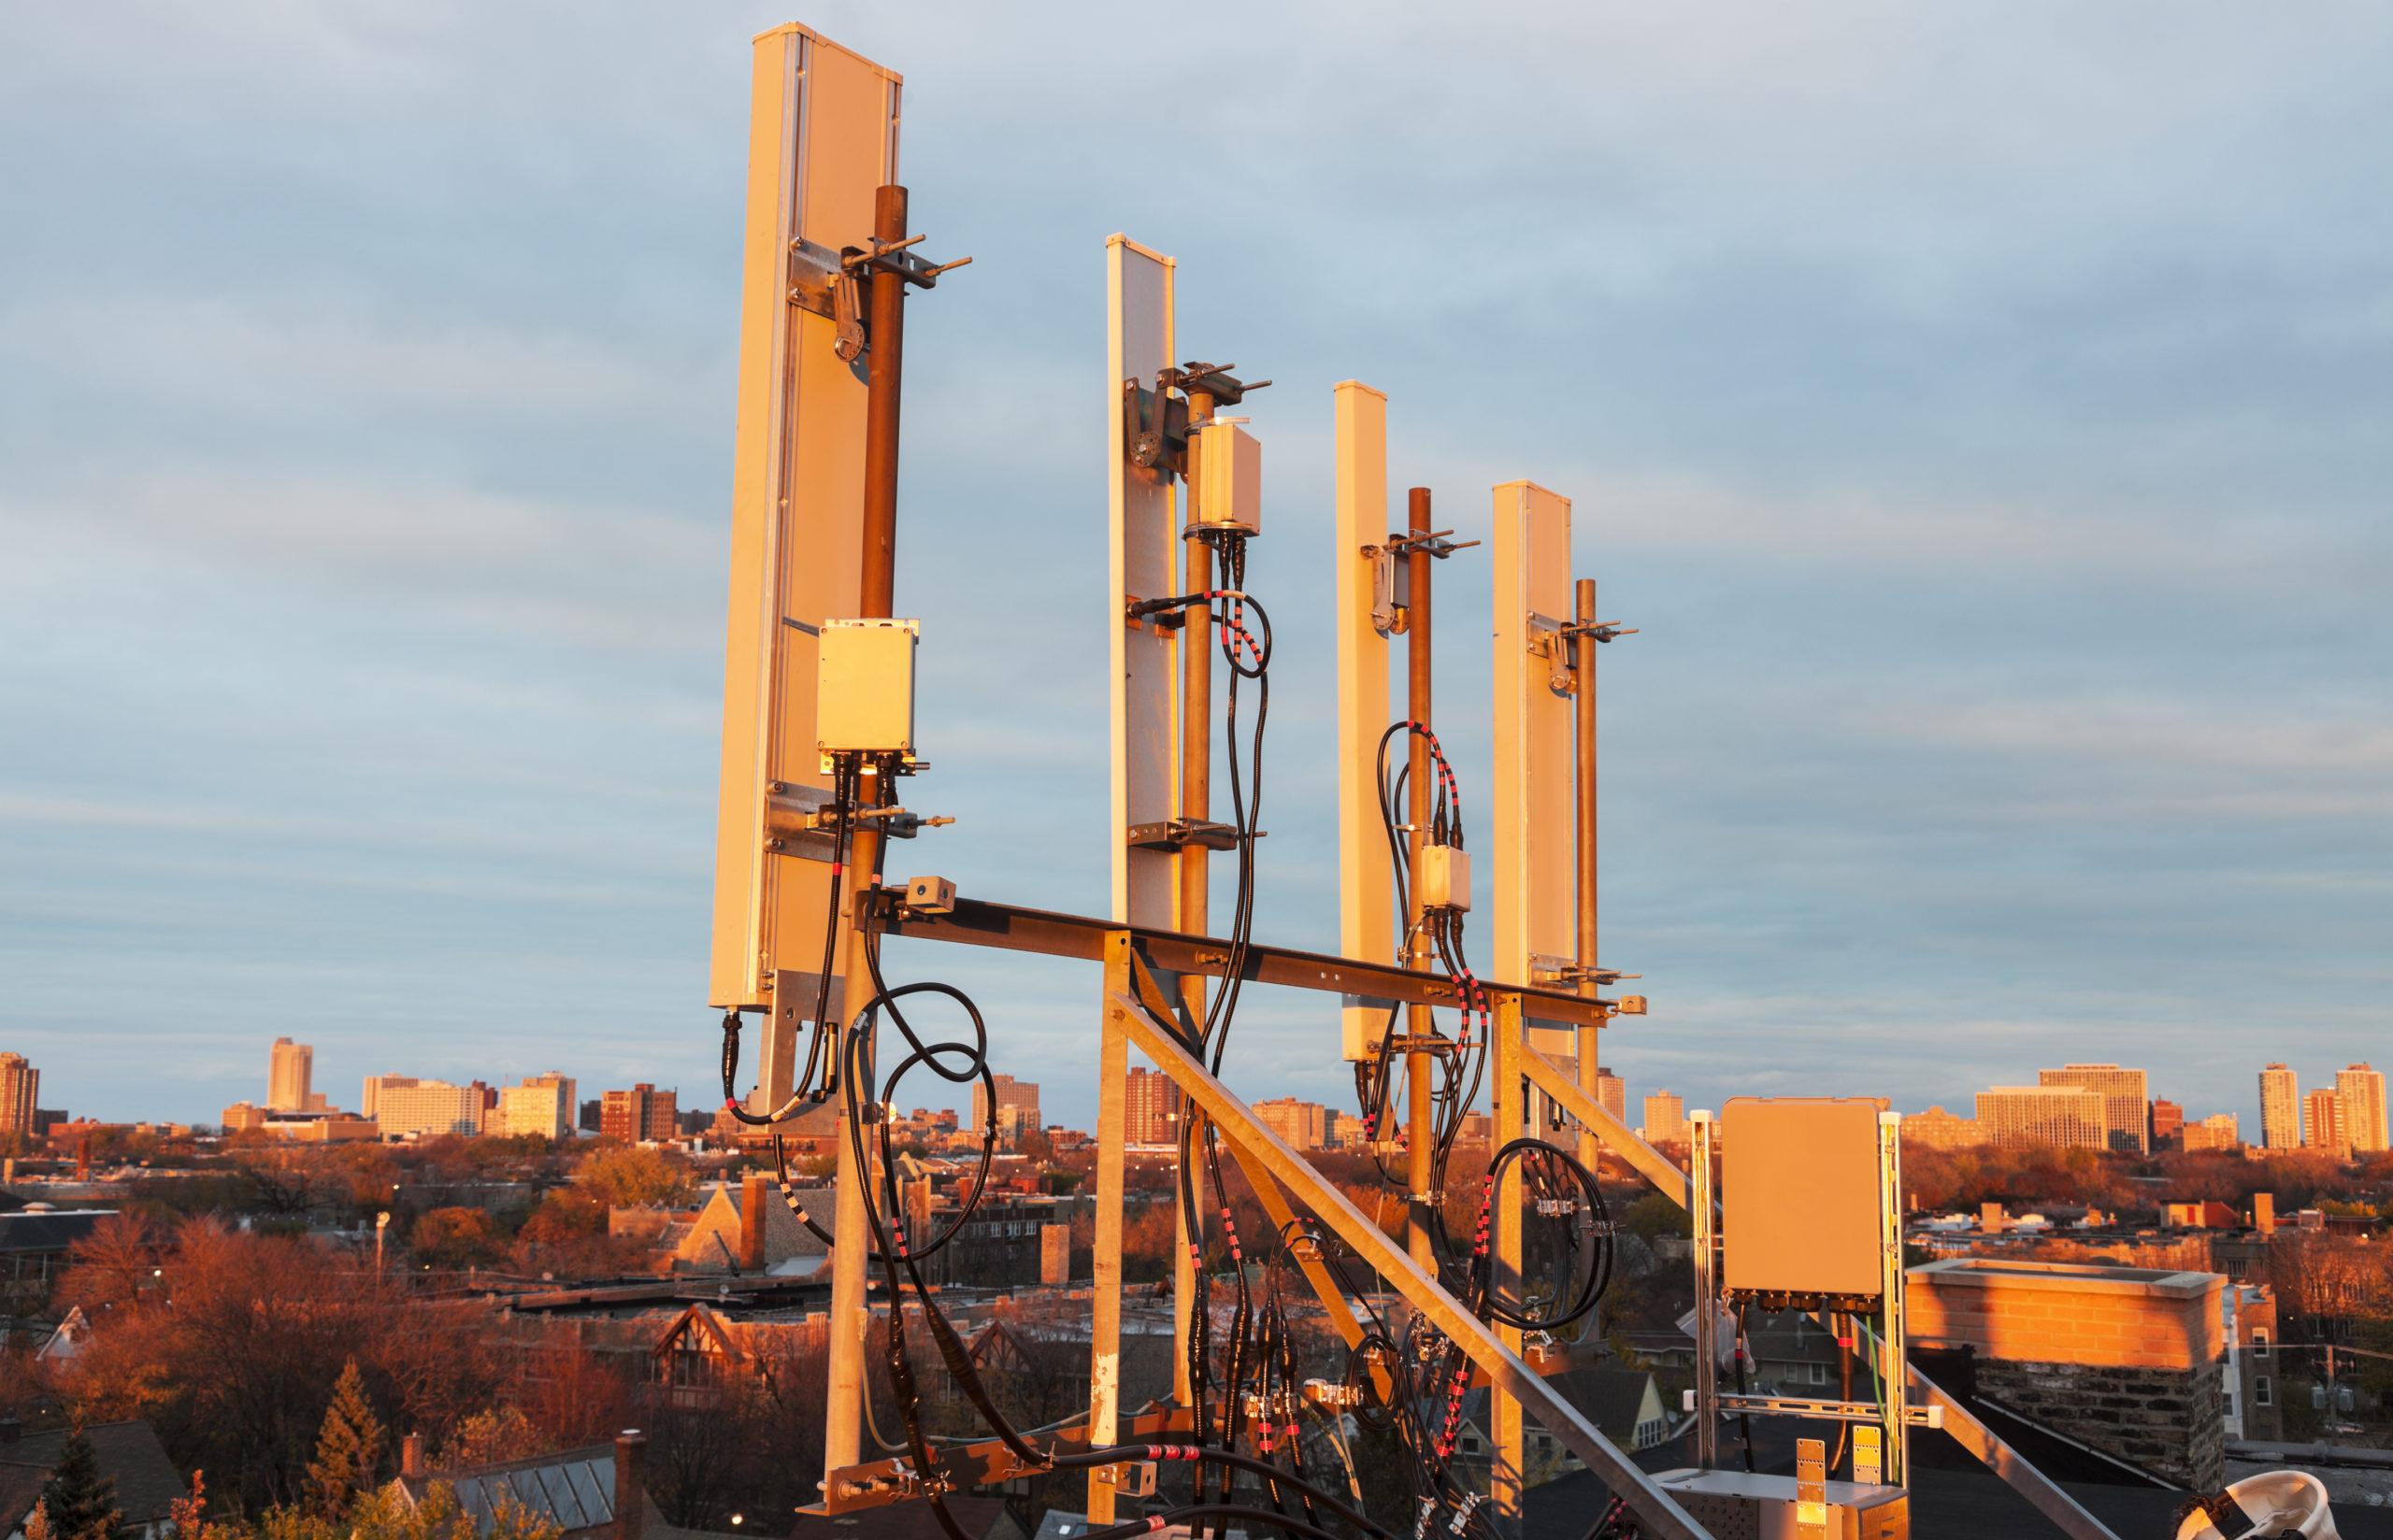 Cellular antennas in the sunset light